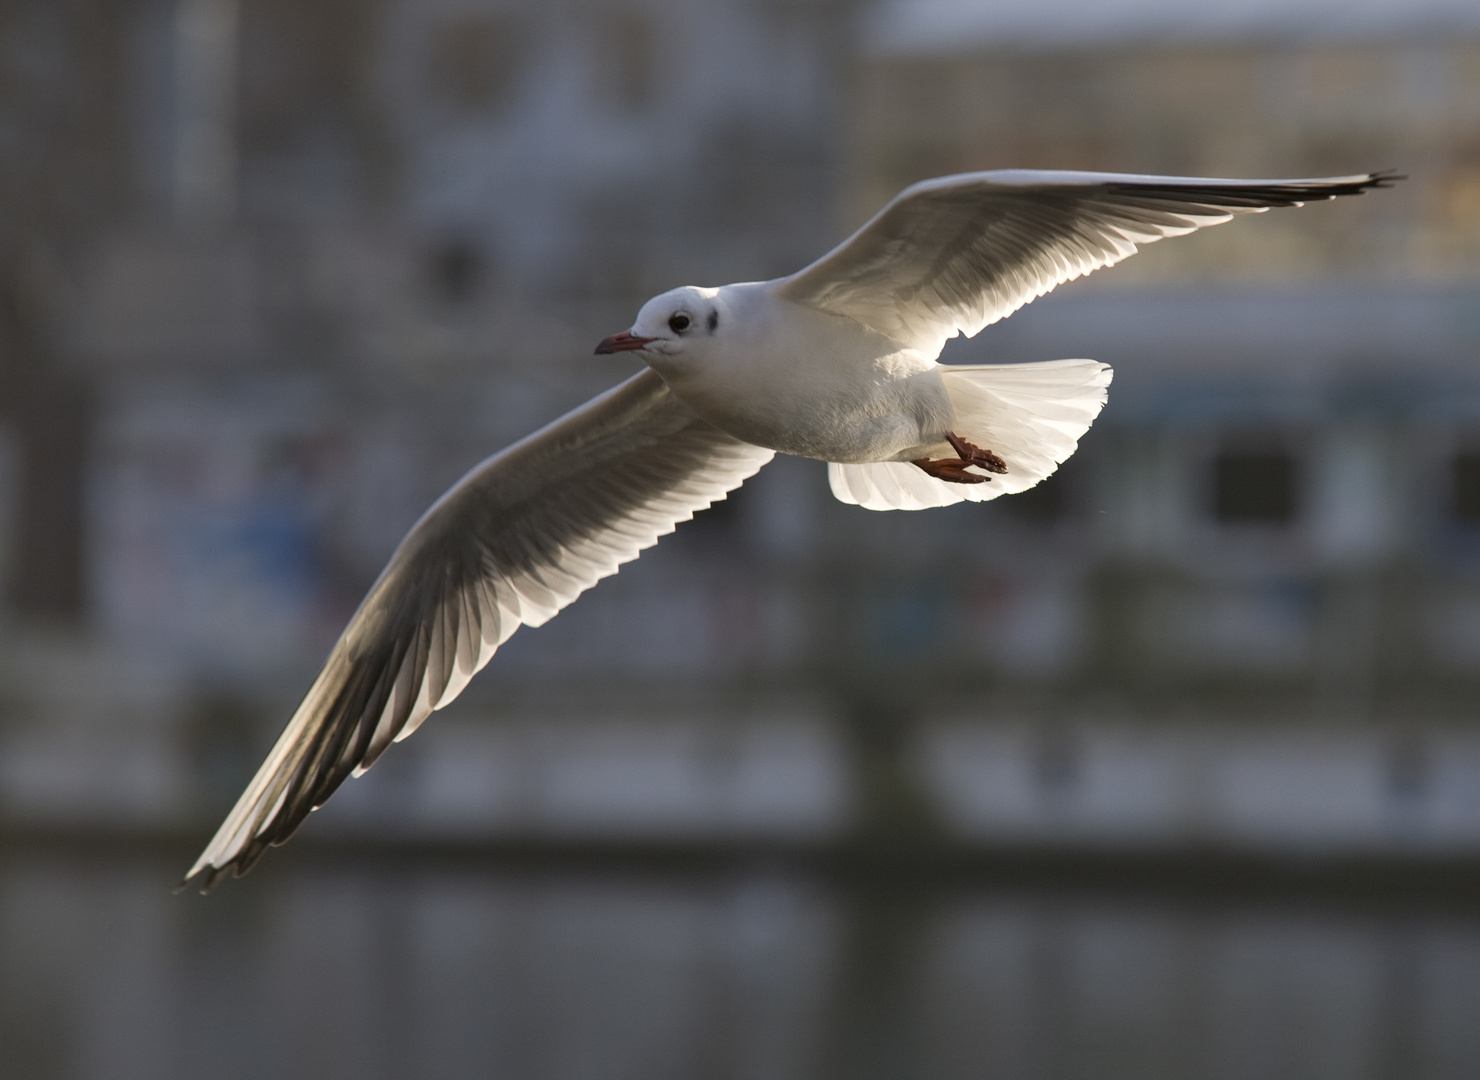 Der fliegende Vogel getarnt als fliegende Möwe